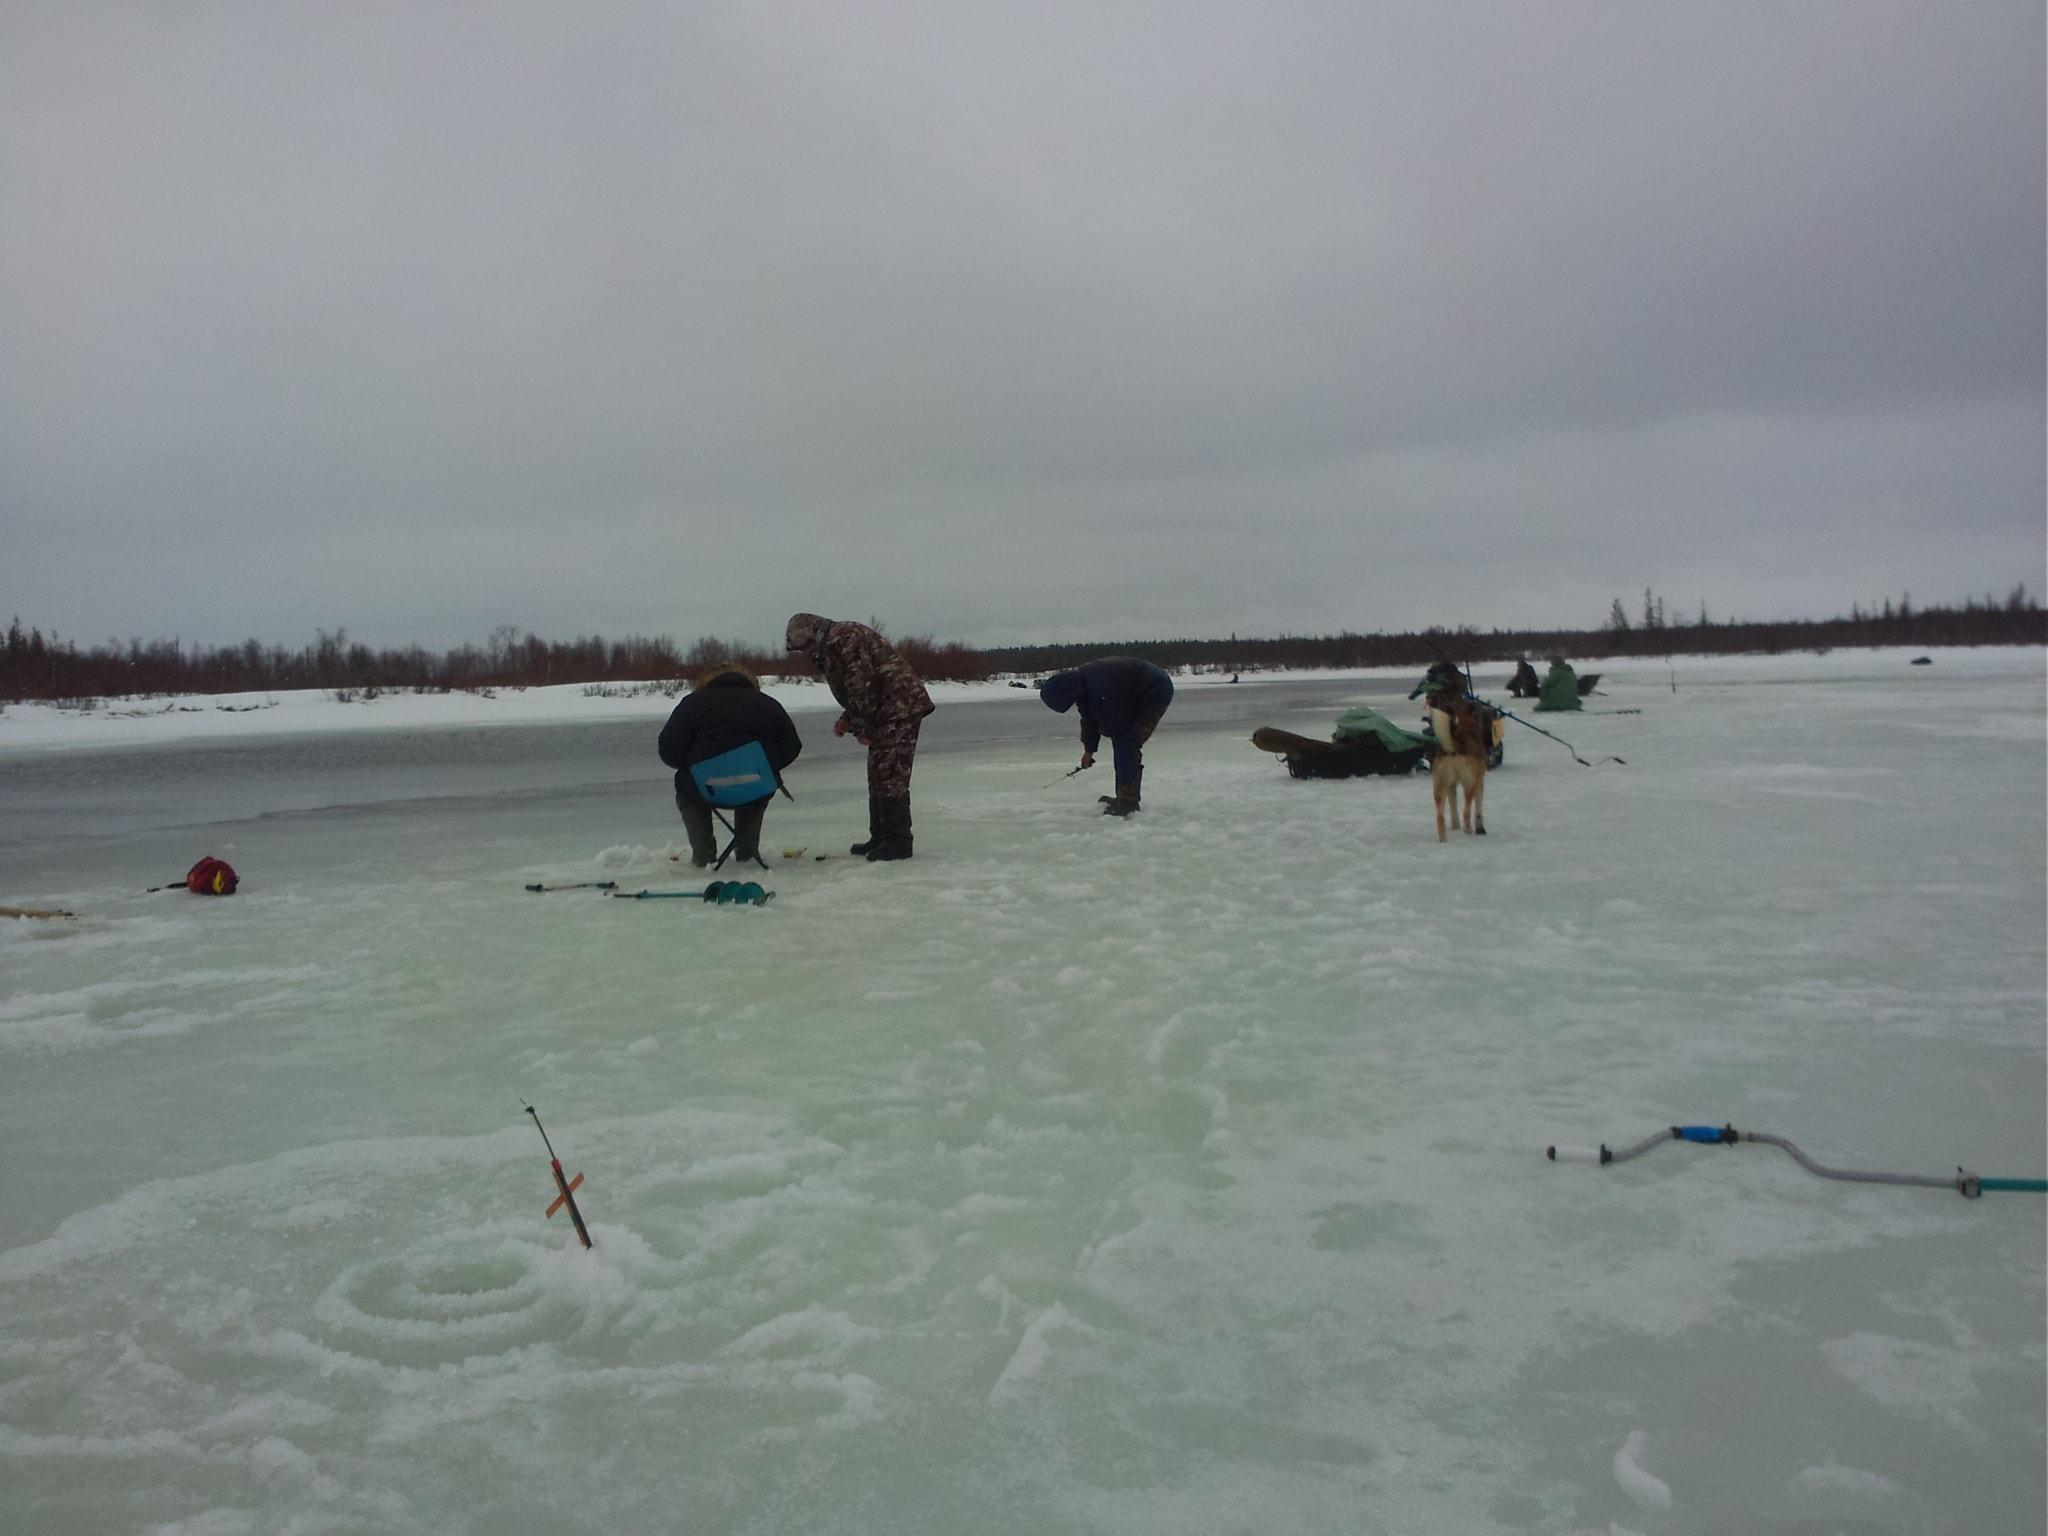 http://murman-fishing.ru/forum/download/file.php?id=87038&mode=view